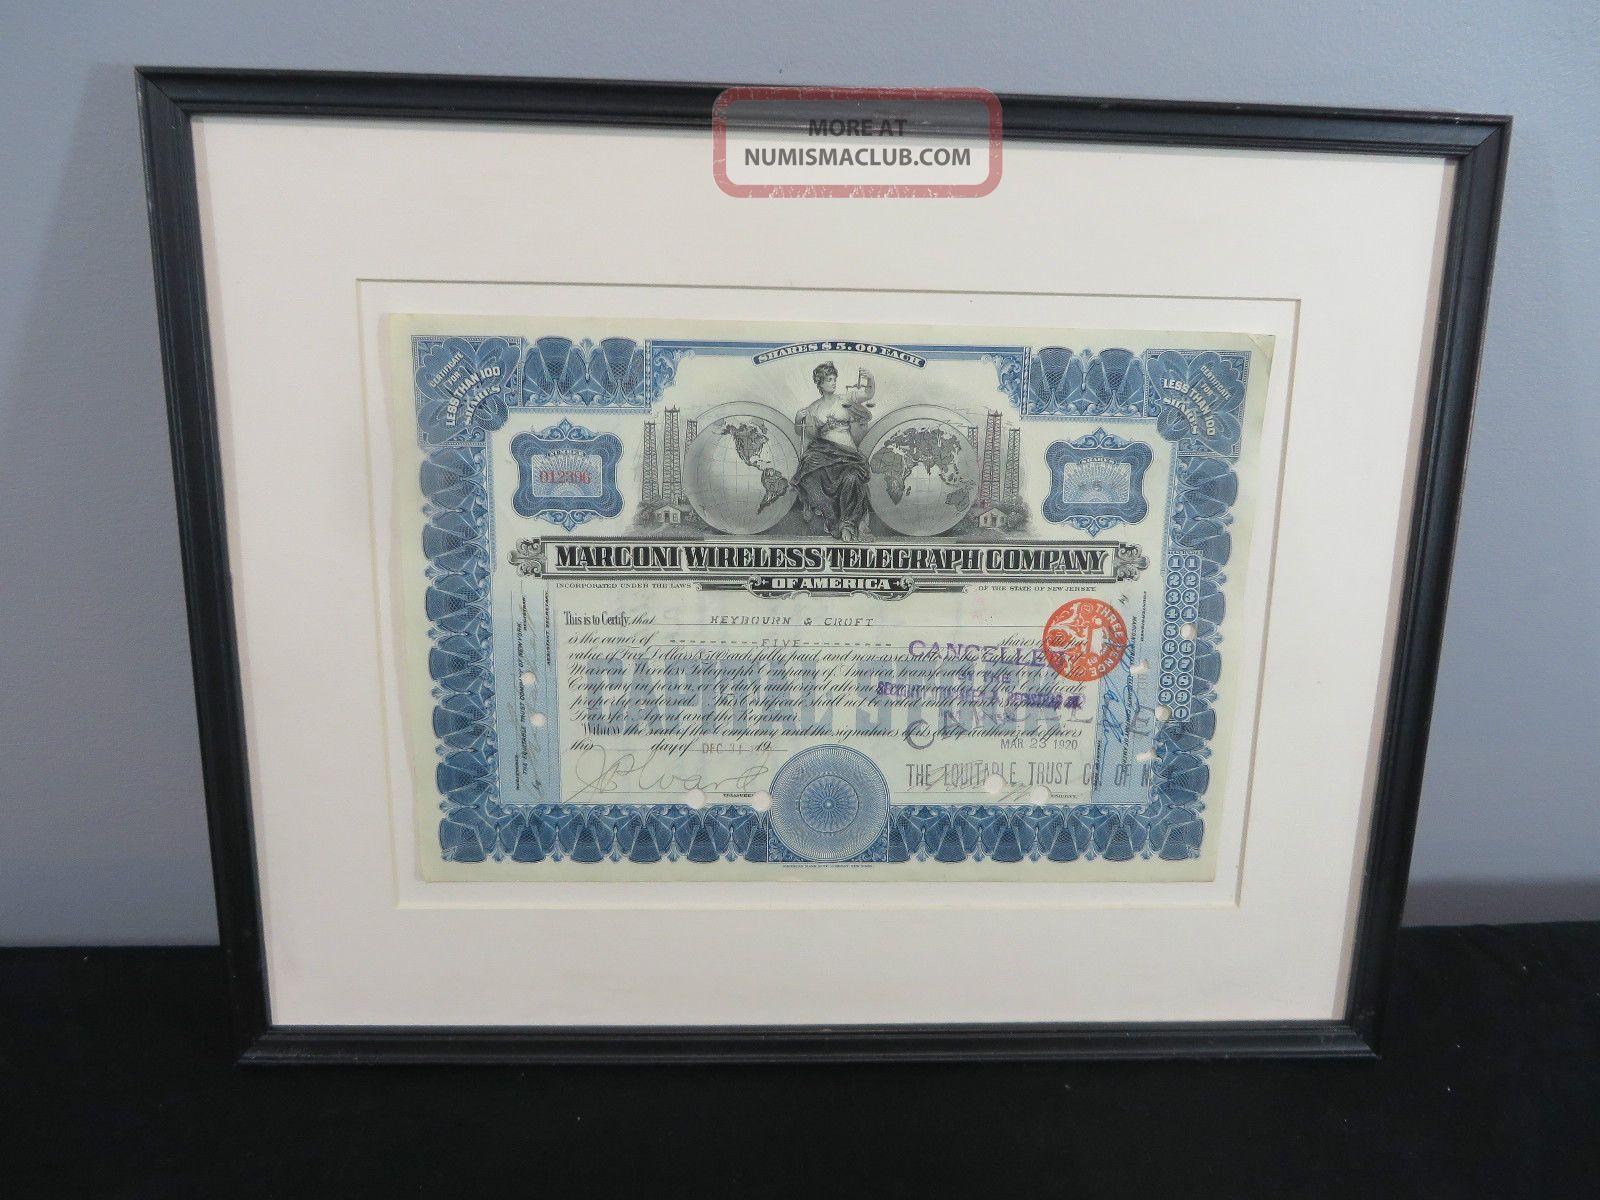 Marconi Wireless Telegraph Company Of America Stock Certificate 1912 Framed Stocks & Bonds, Scripophily photo